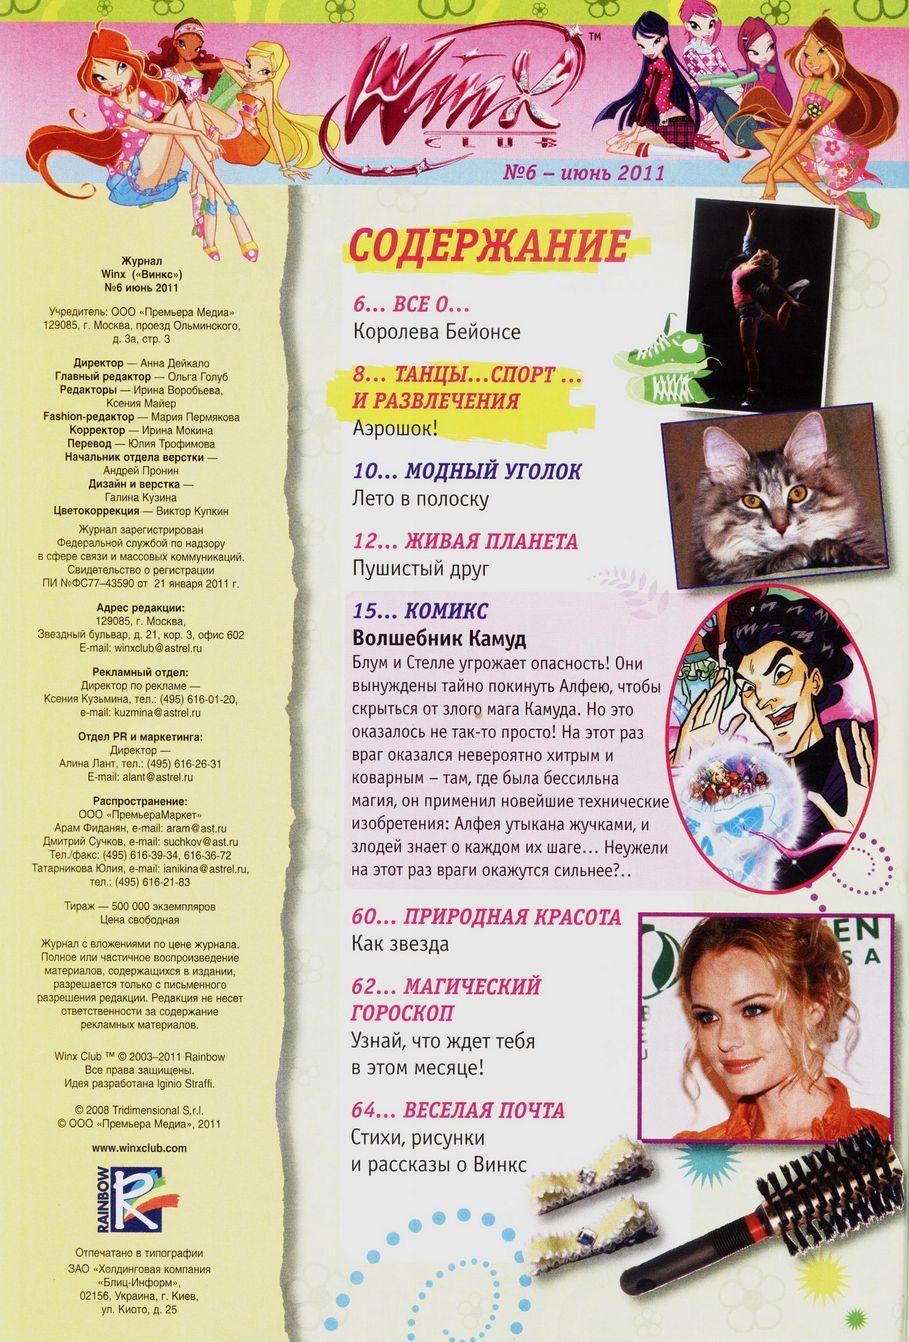 Комикс Винкс Winx - Волшебник Камуд (Журнал Винкс №6 2011) - стр. 4